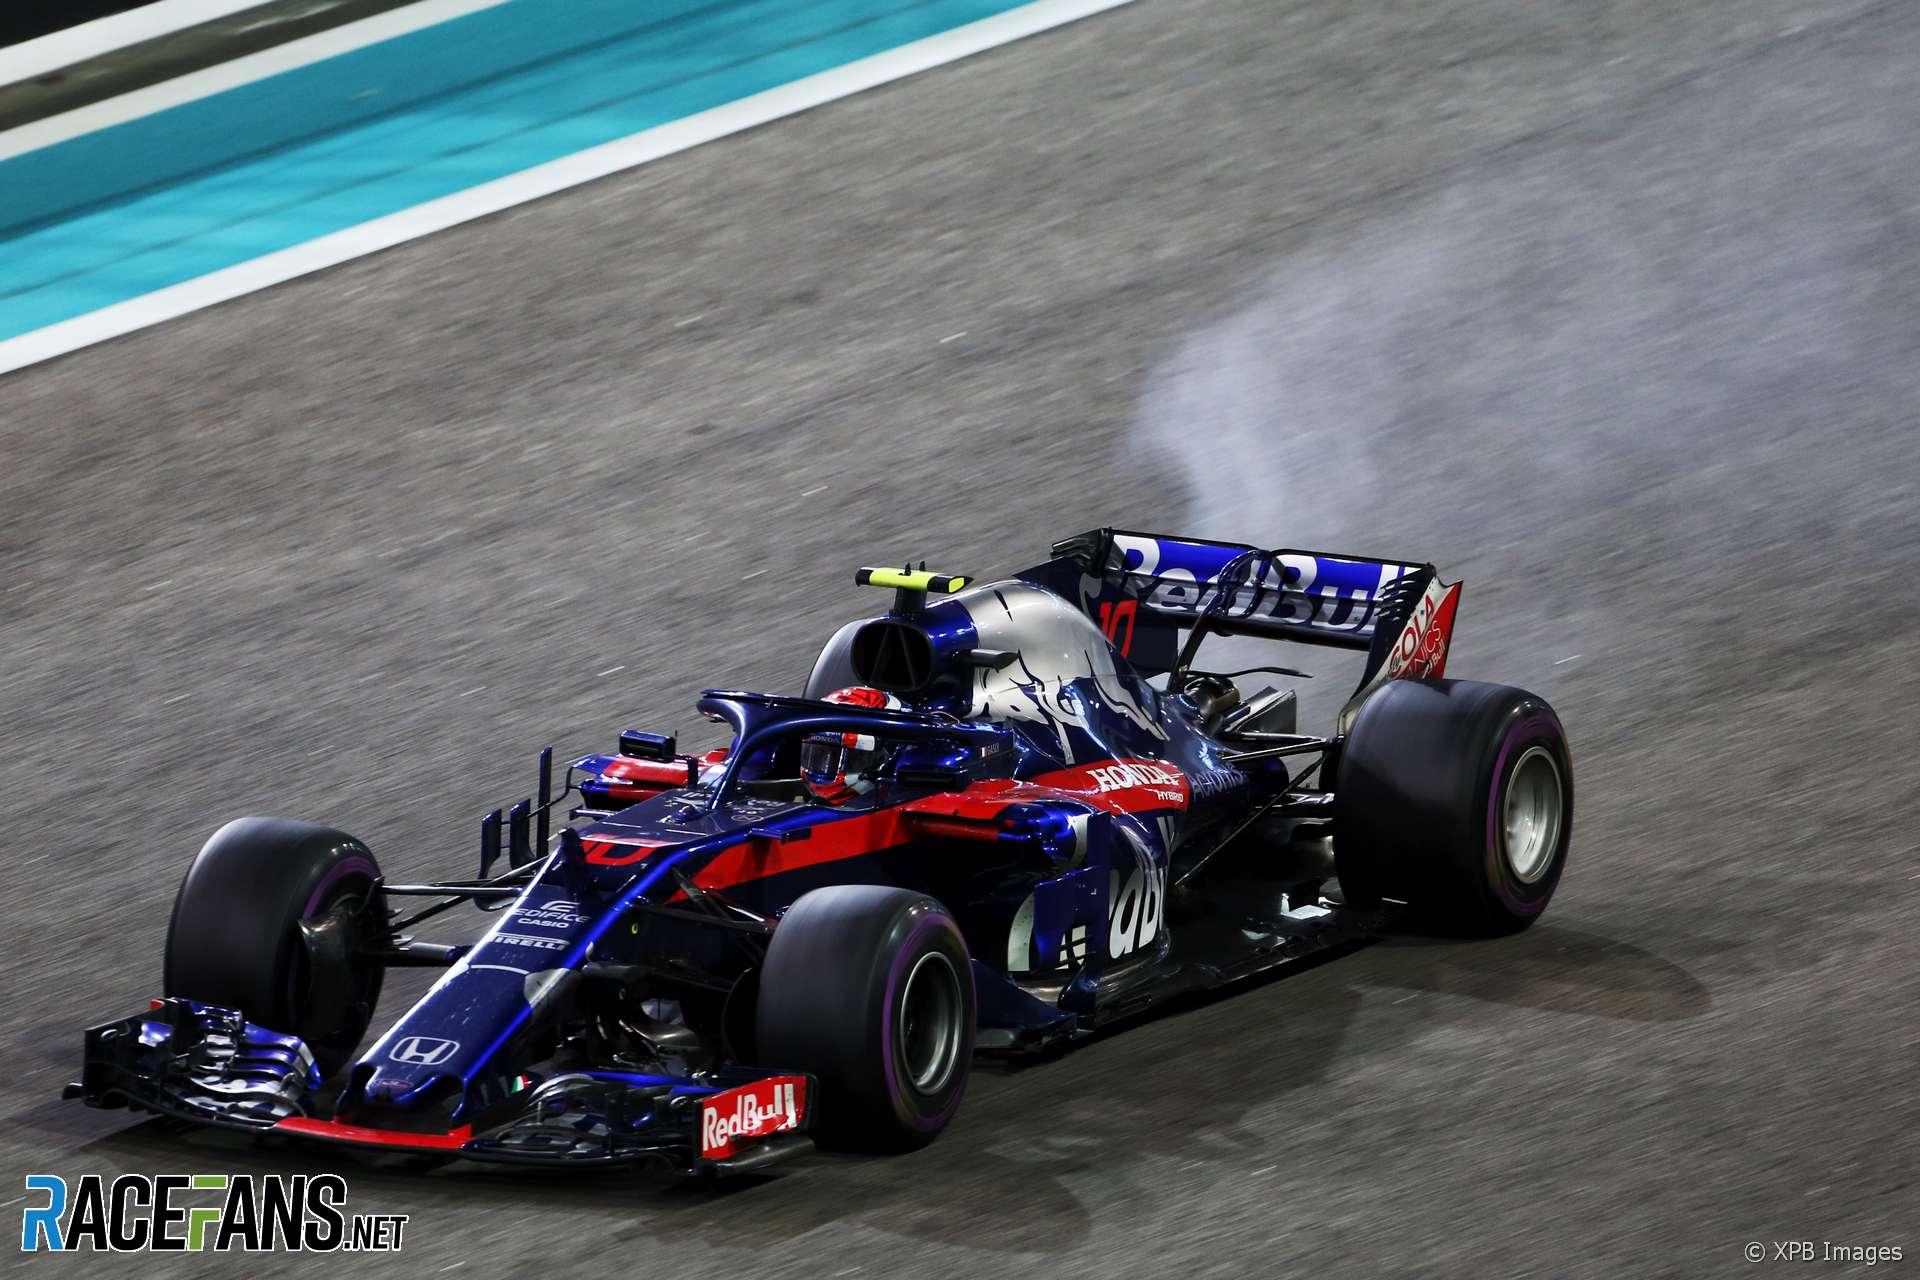 Pierre Gasly, Toro Rosso, Yas Marina, 2018